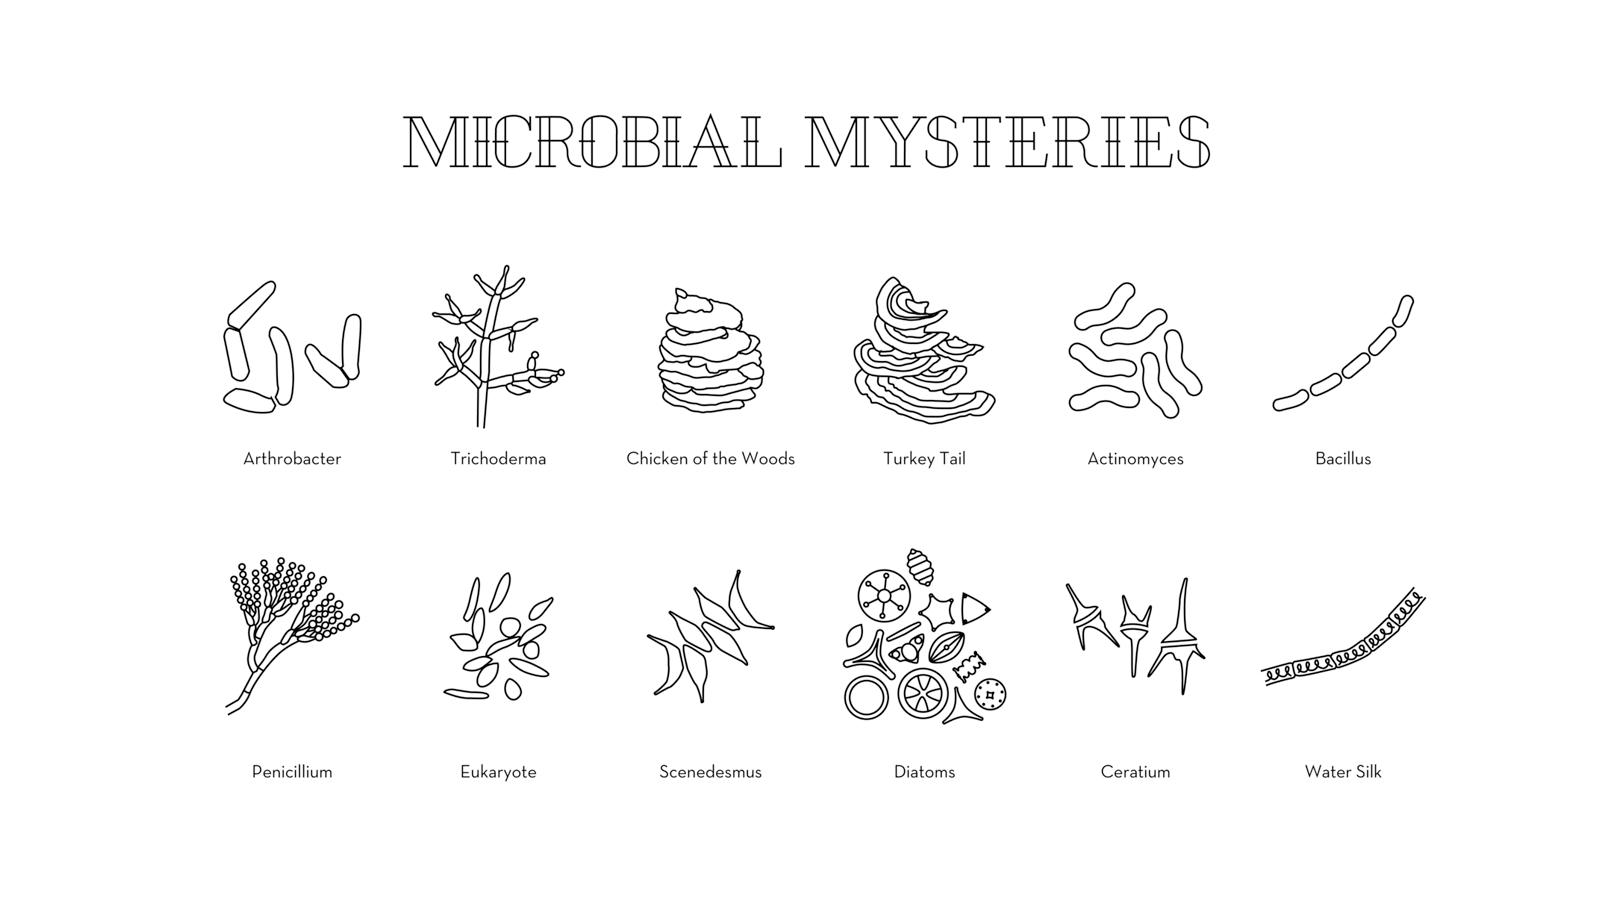 826_Individuals_Microbes_02.png